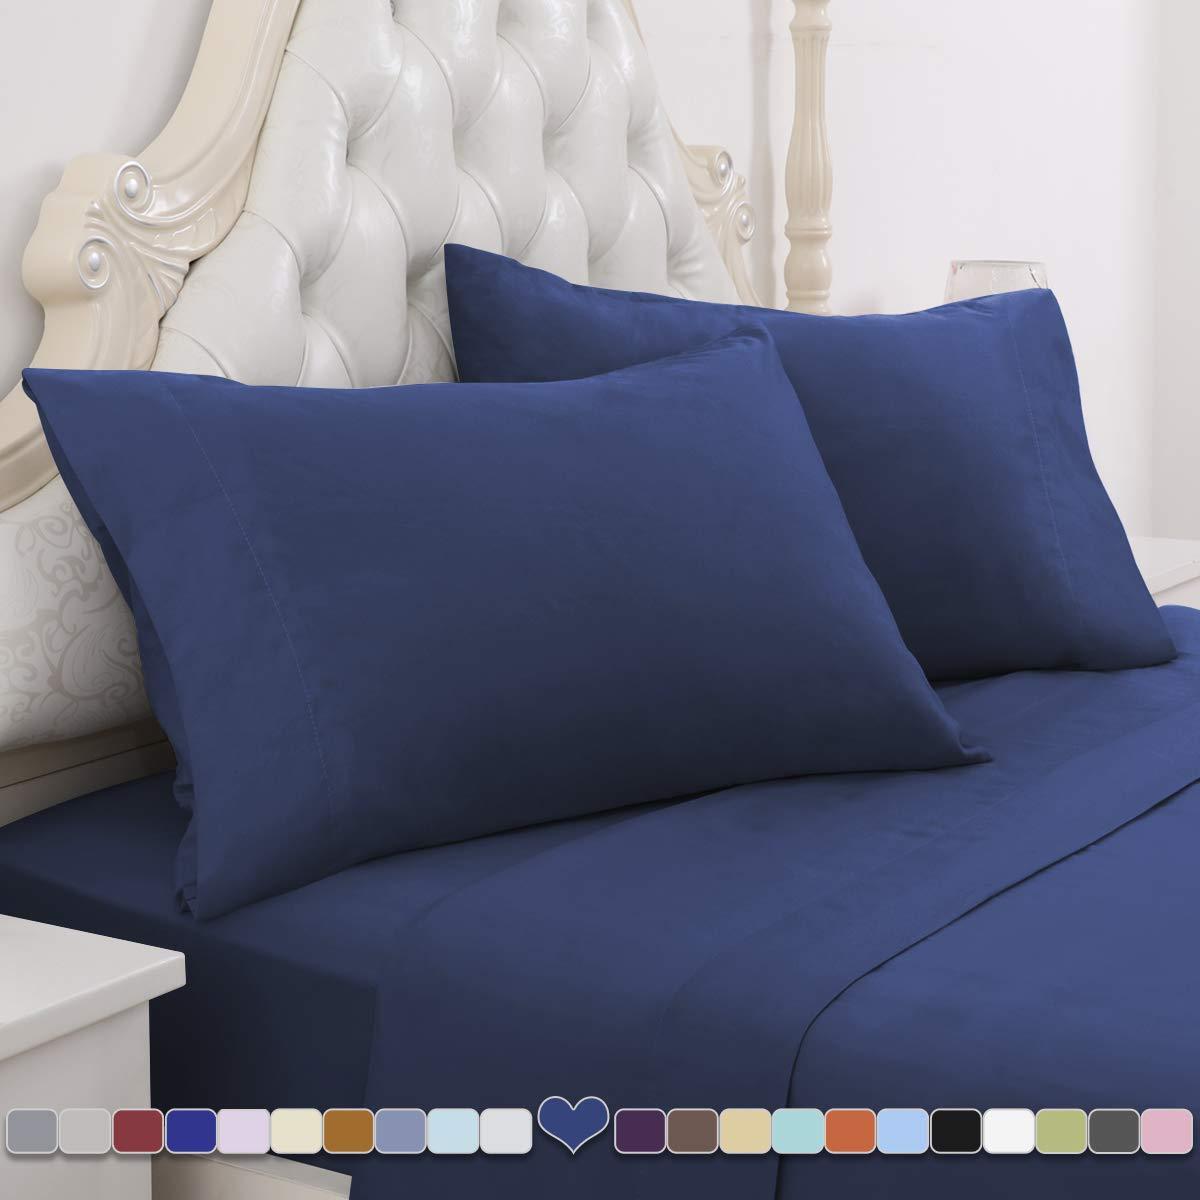 HOMEIDEAS 4 Piece Bed Sheet Set (Full, Navy Blue) 100% Brushed Microfiber 1800 Bedding Sheets - Deep Pockets